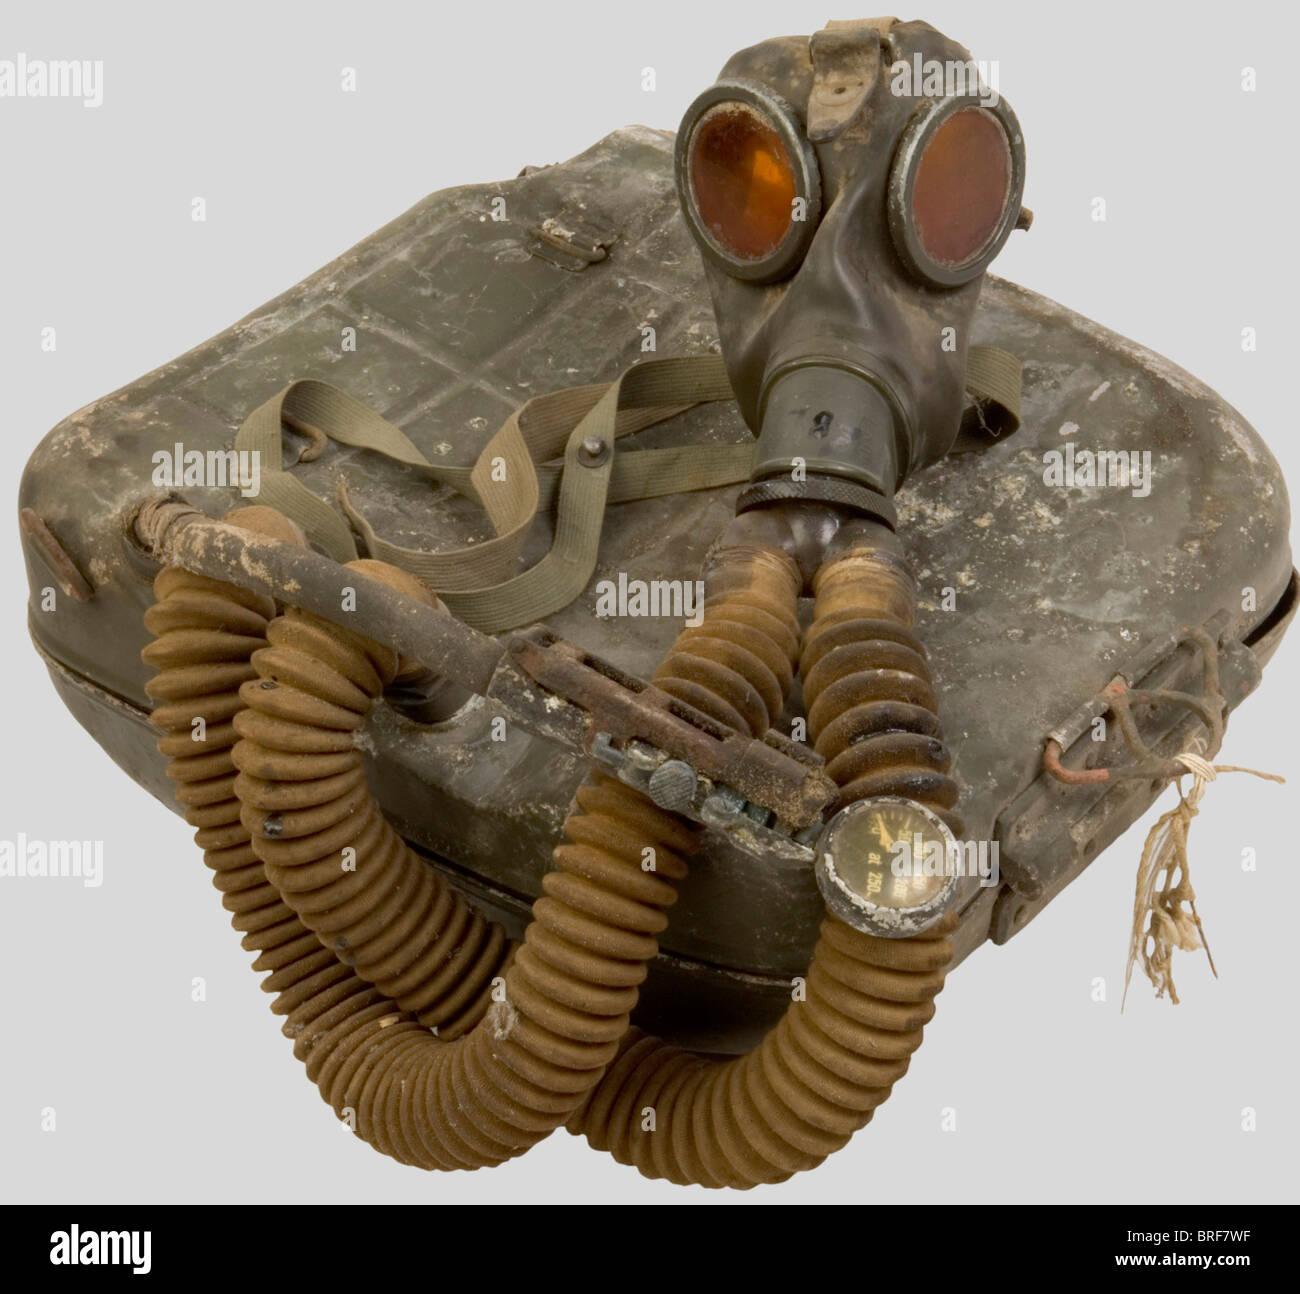 A 'Heeres-Atmer', German dorsal respiratory system. Feldgrau painted aluminium case, including its mask - Stock Image